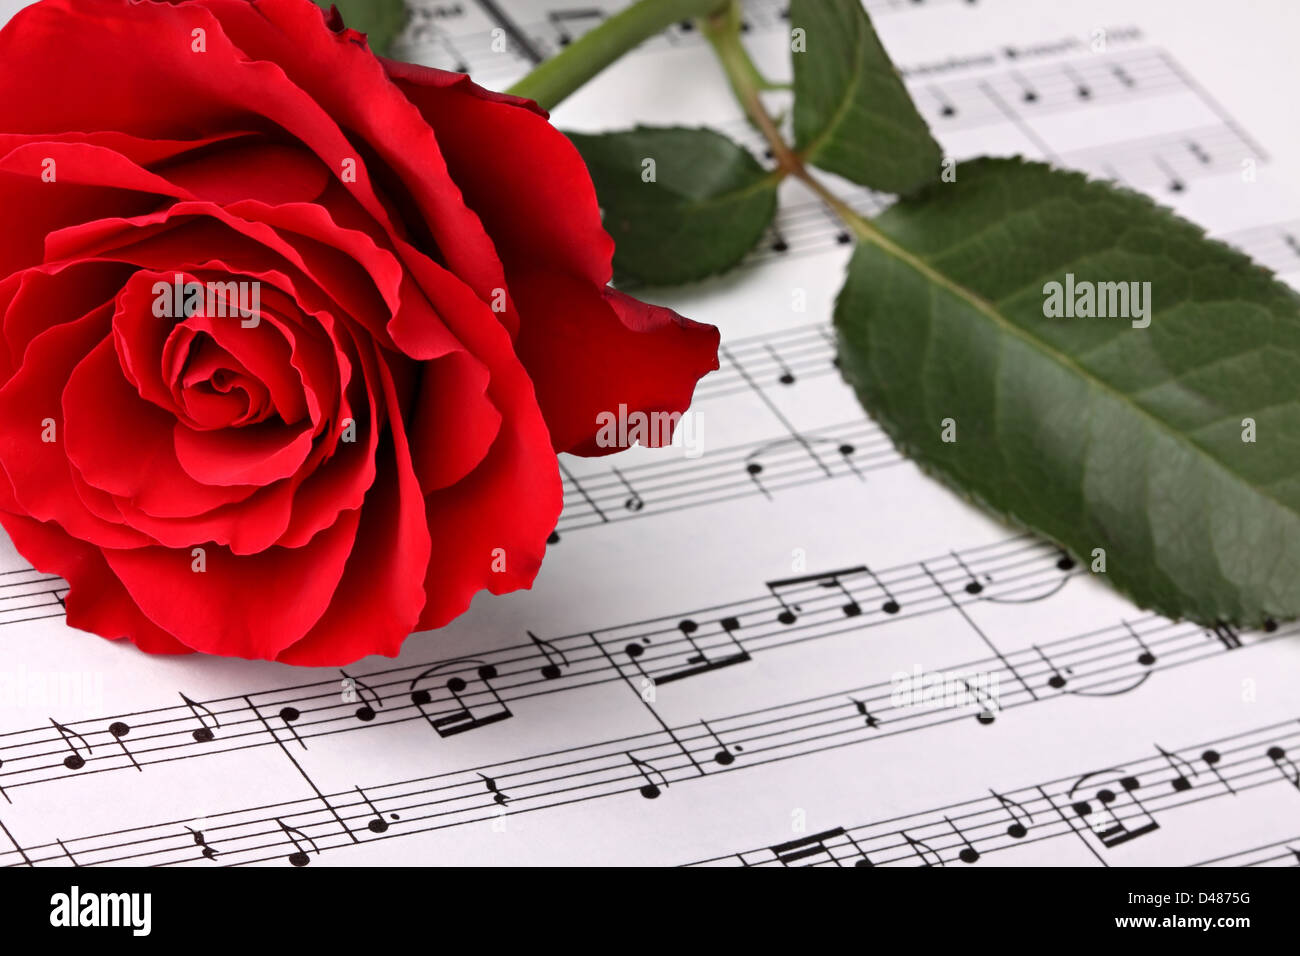 red rose on music sheet. - Stock Image